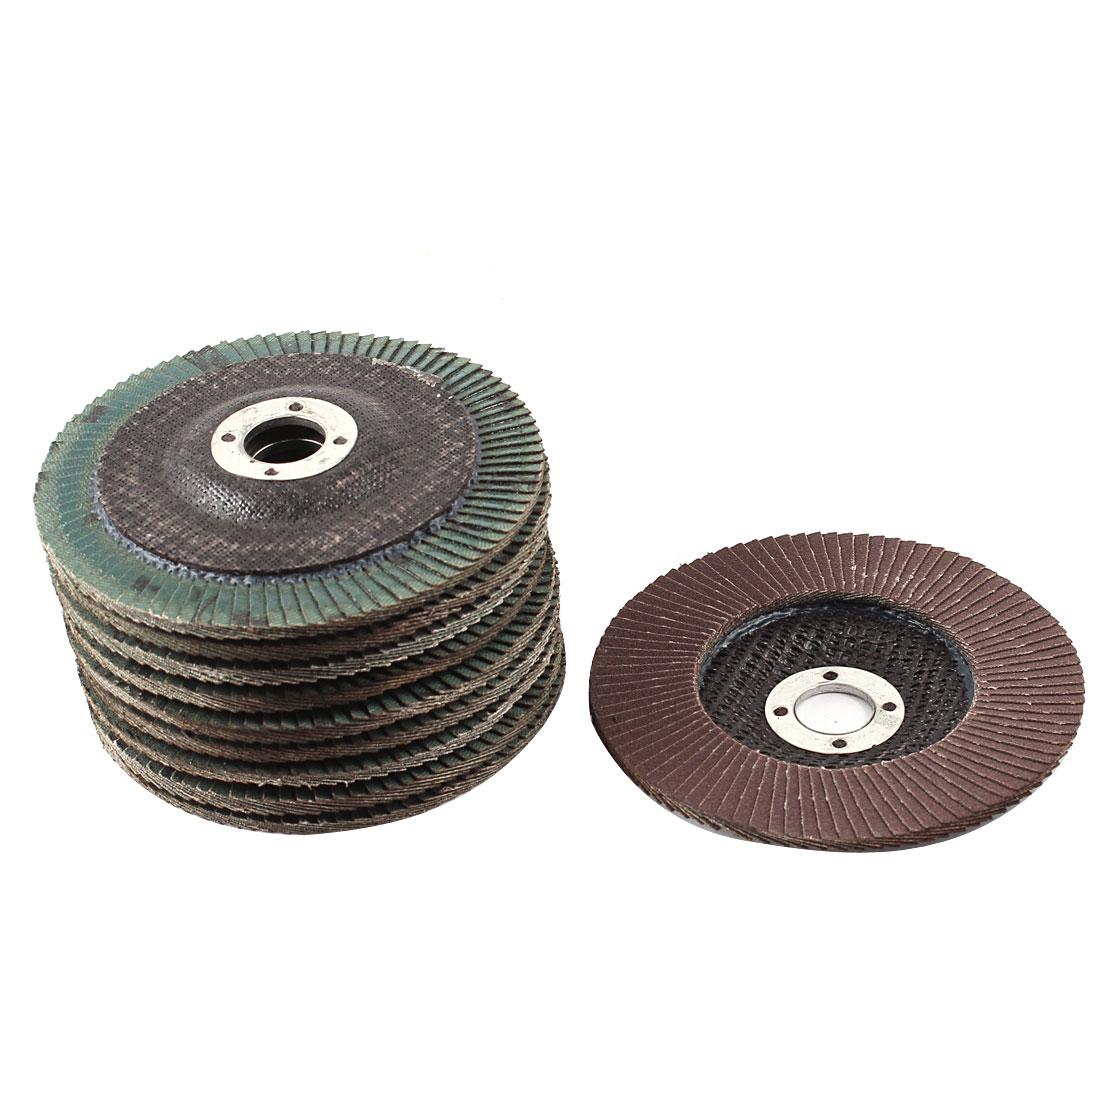 Metal Polishing 100mm Dia 320# Flap Sanding Abrasive Wheels Discs 10Pcs